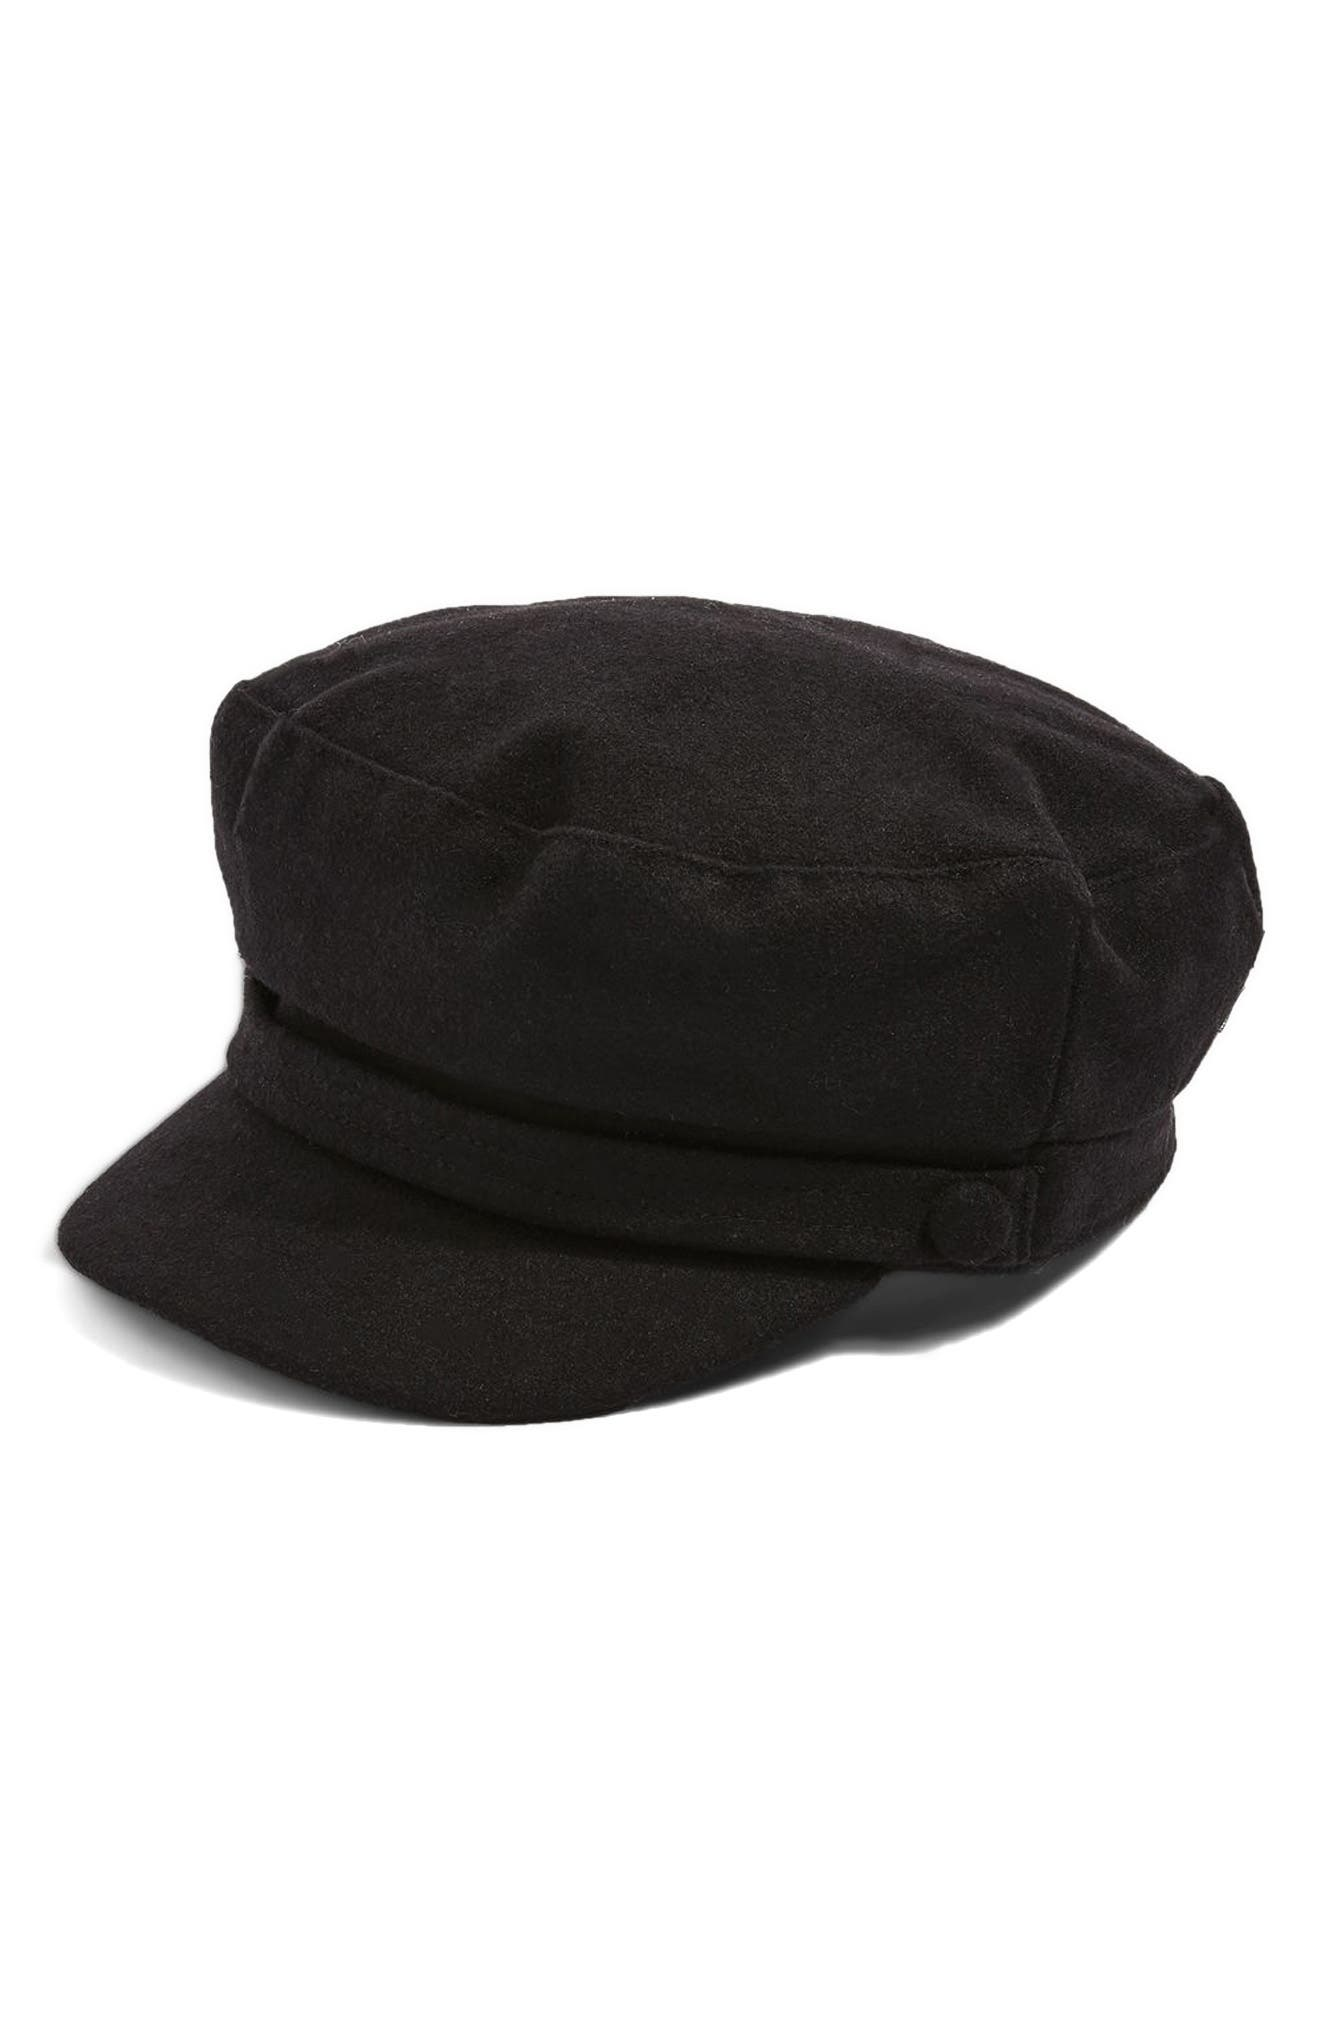 Baker Boy Cap,                         Main,                         color, Black